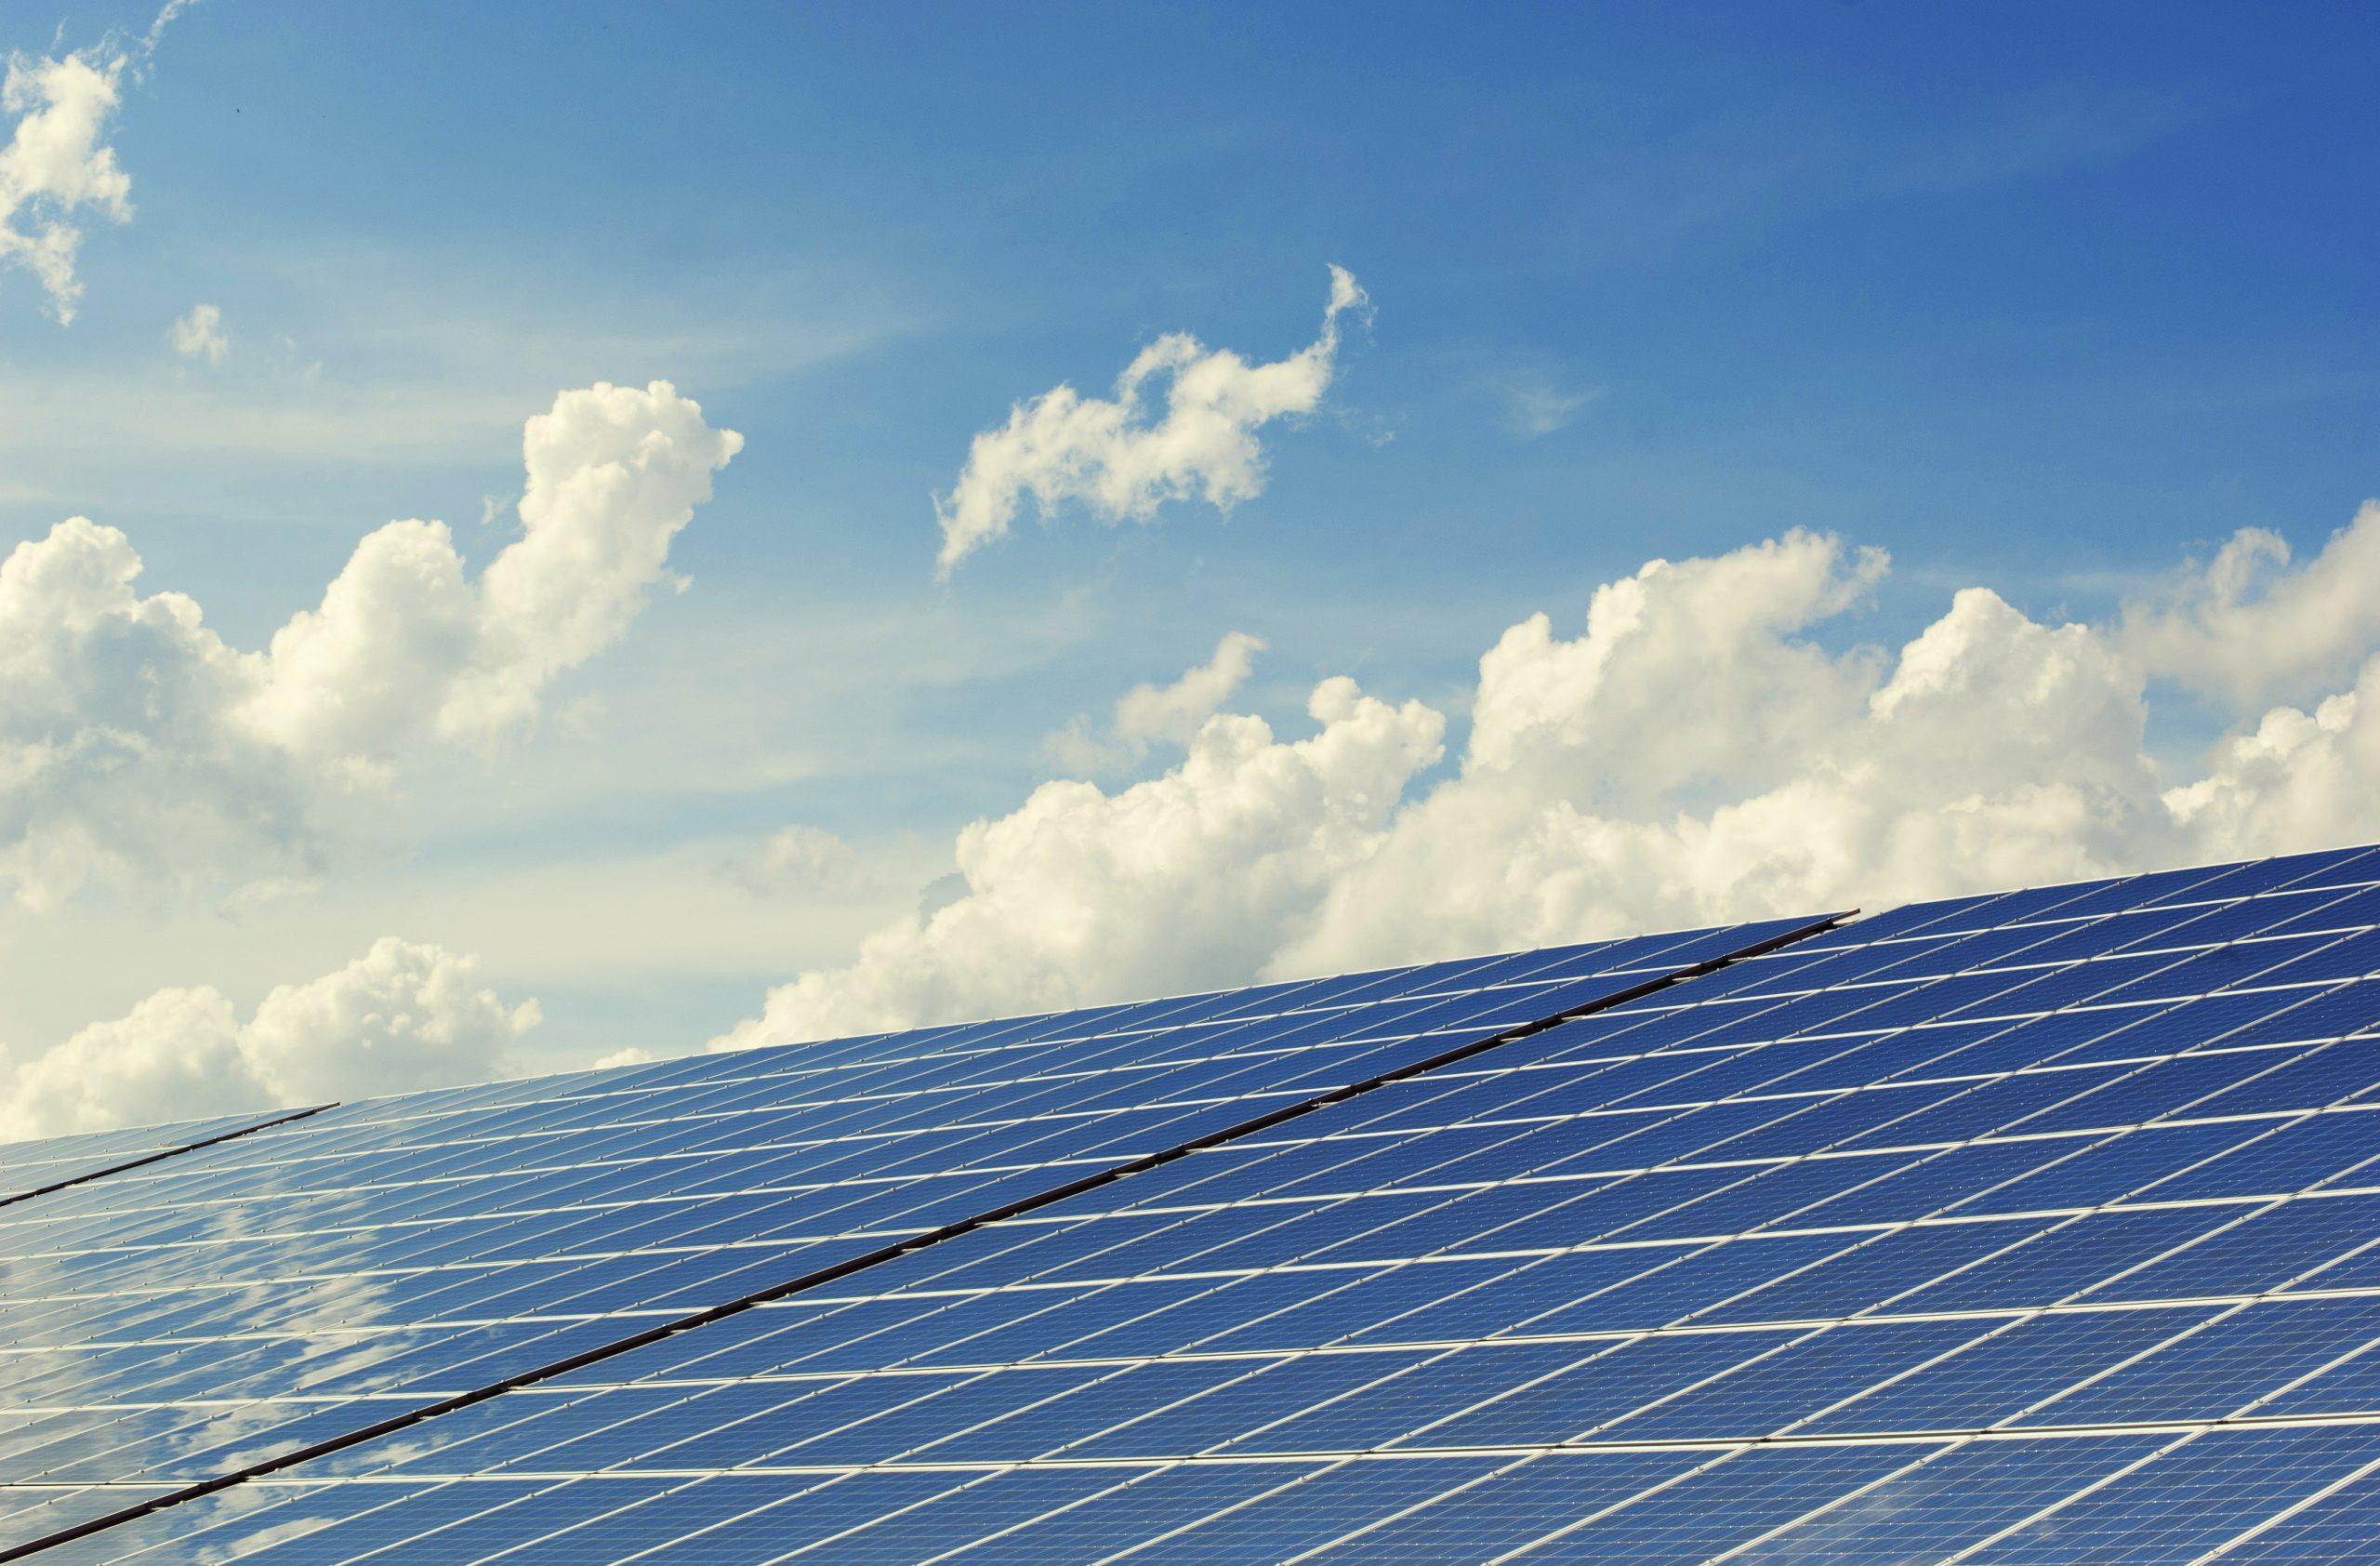 NetZero school construction project uses solar panels